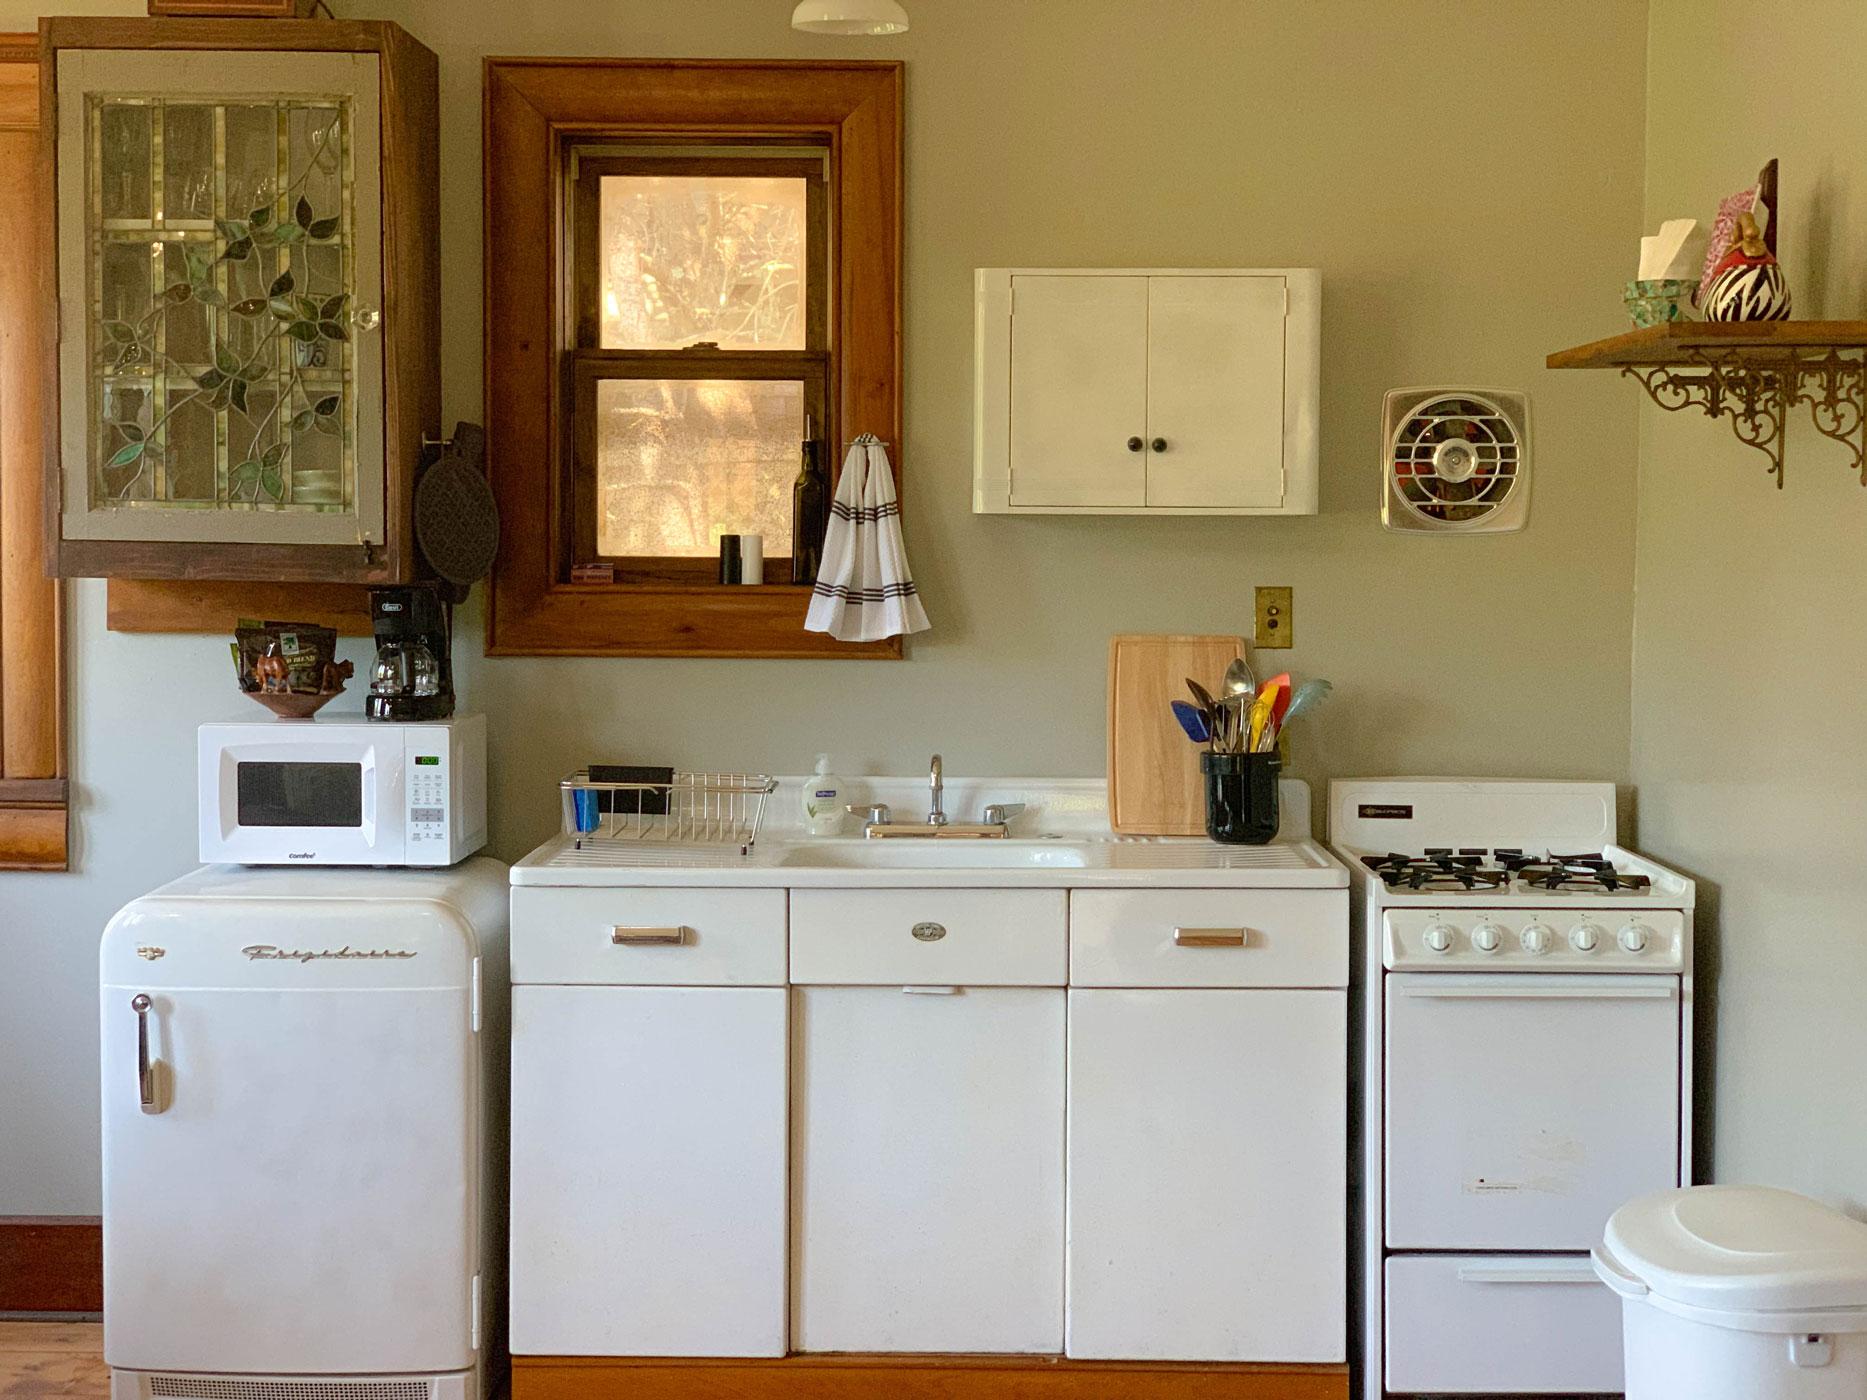 Zebra Cottage kitchen at B. Bryan Preserve in Point Arena, CA